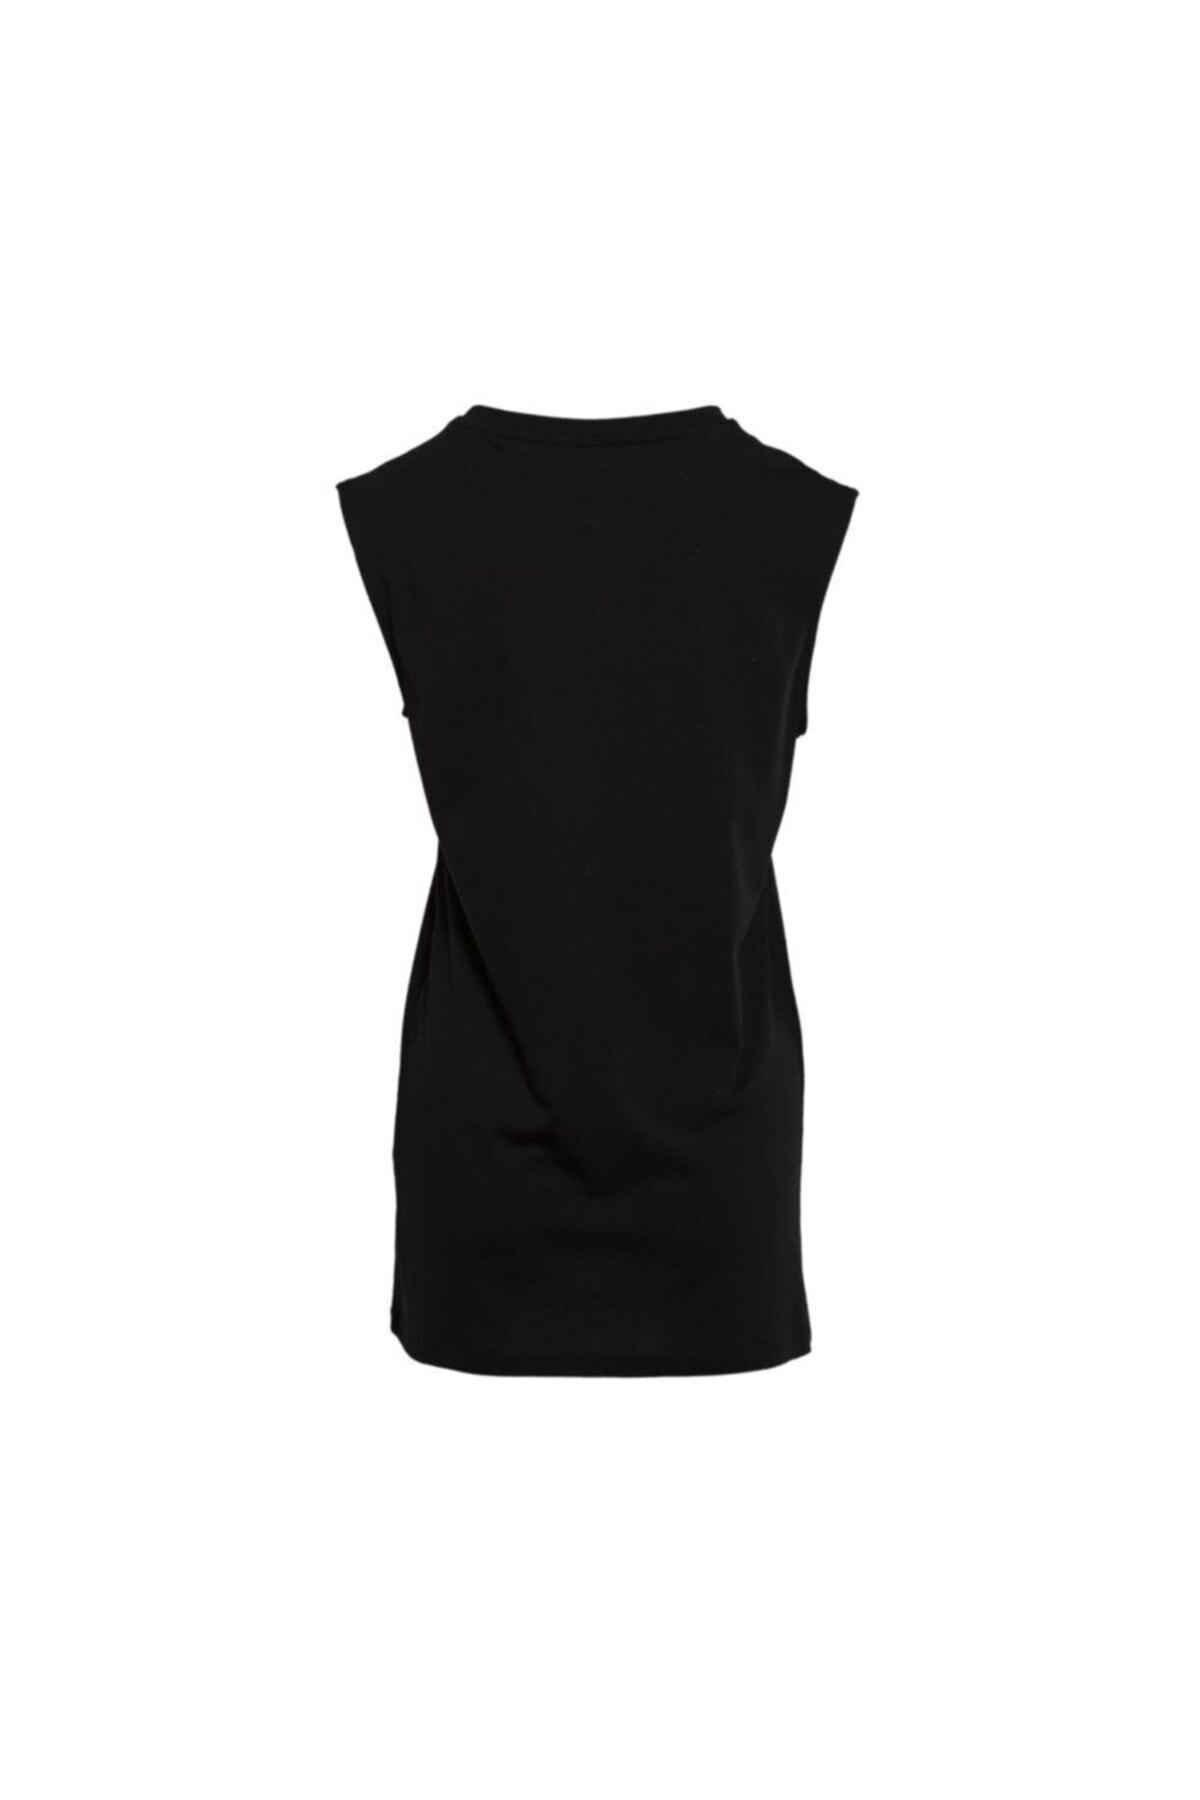 خرید تیشرت زنانه ترک جدید برند New Balance رنگ مشکی کد ty55100631